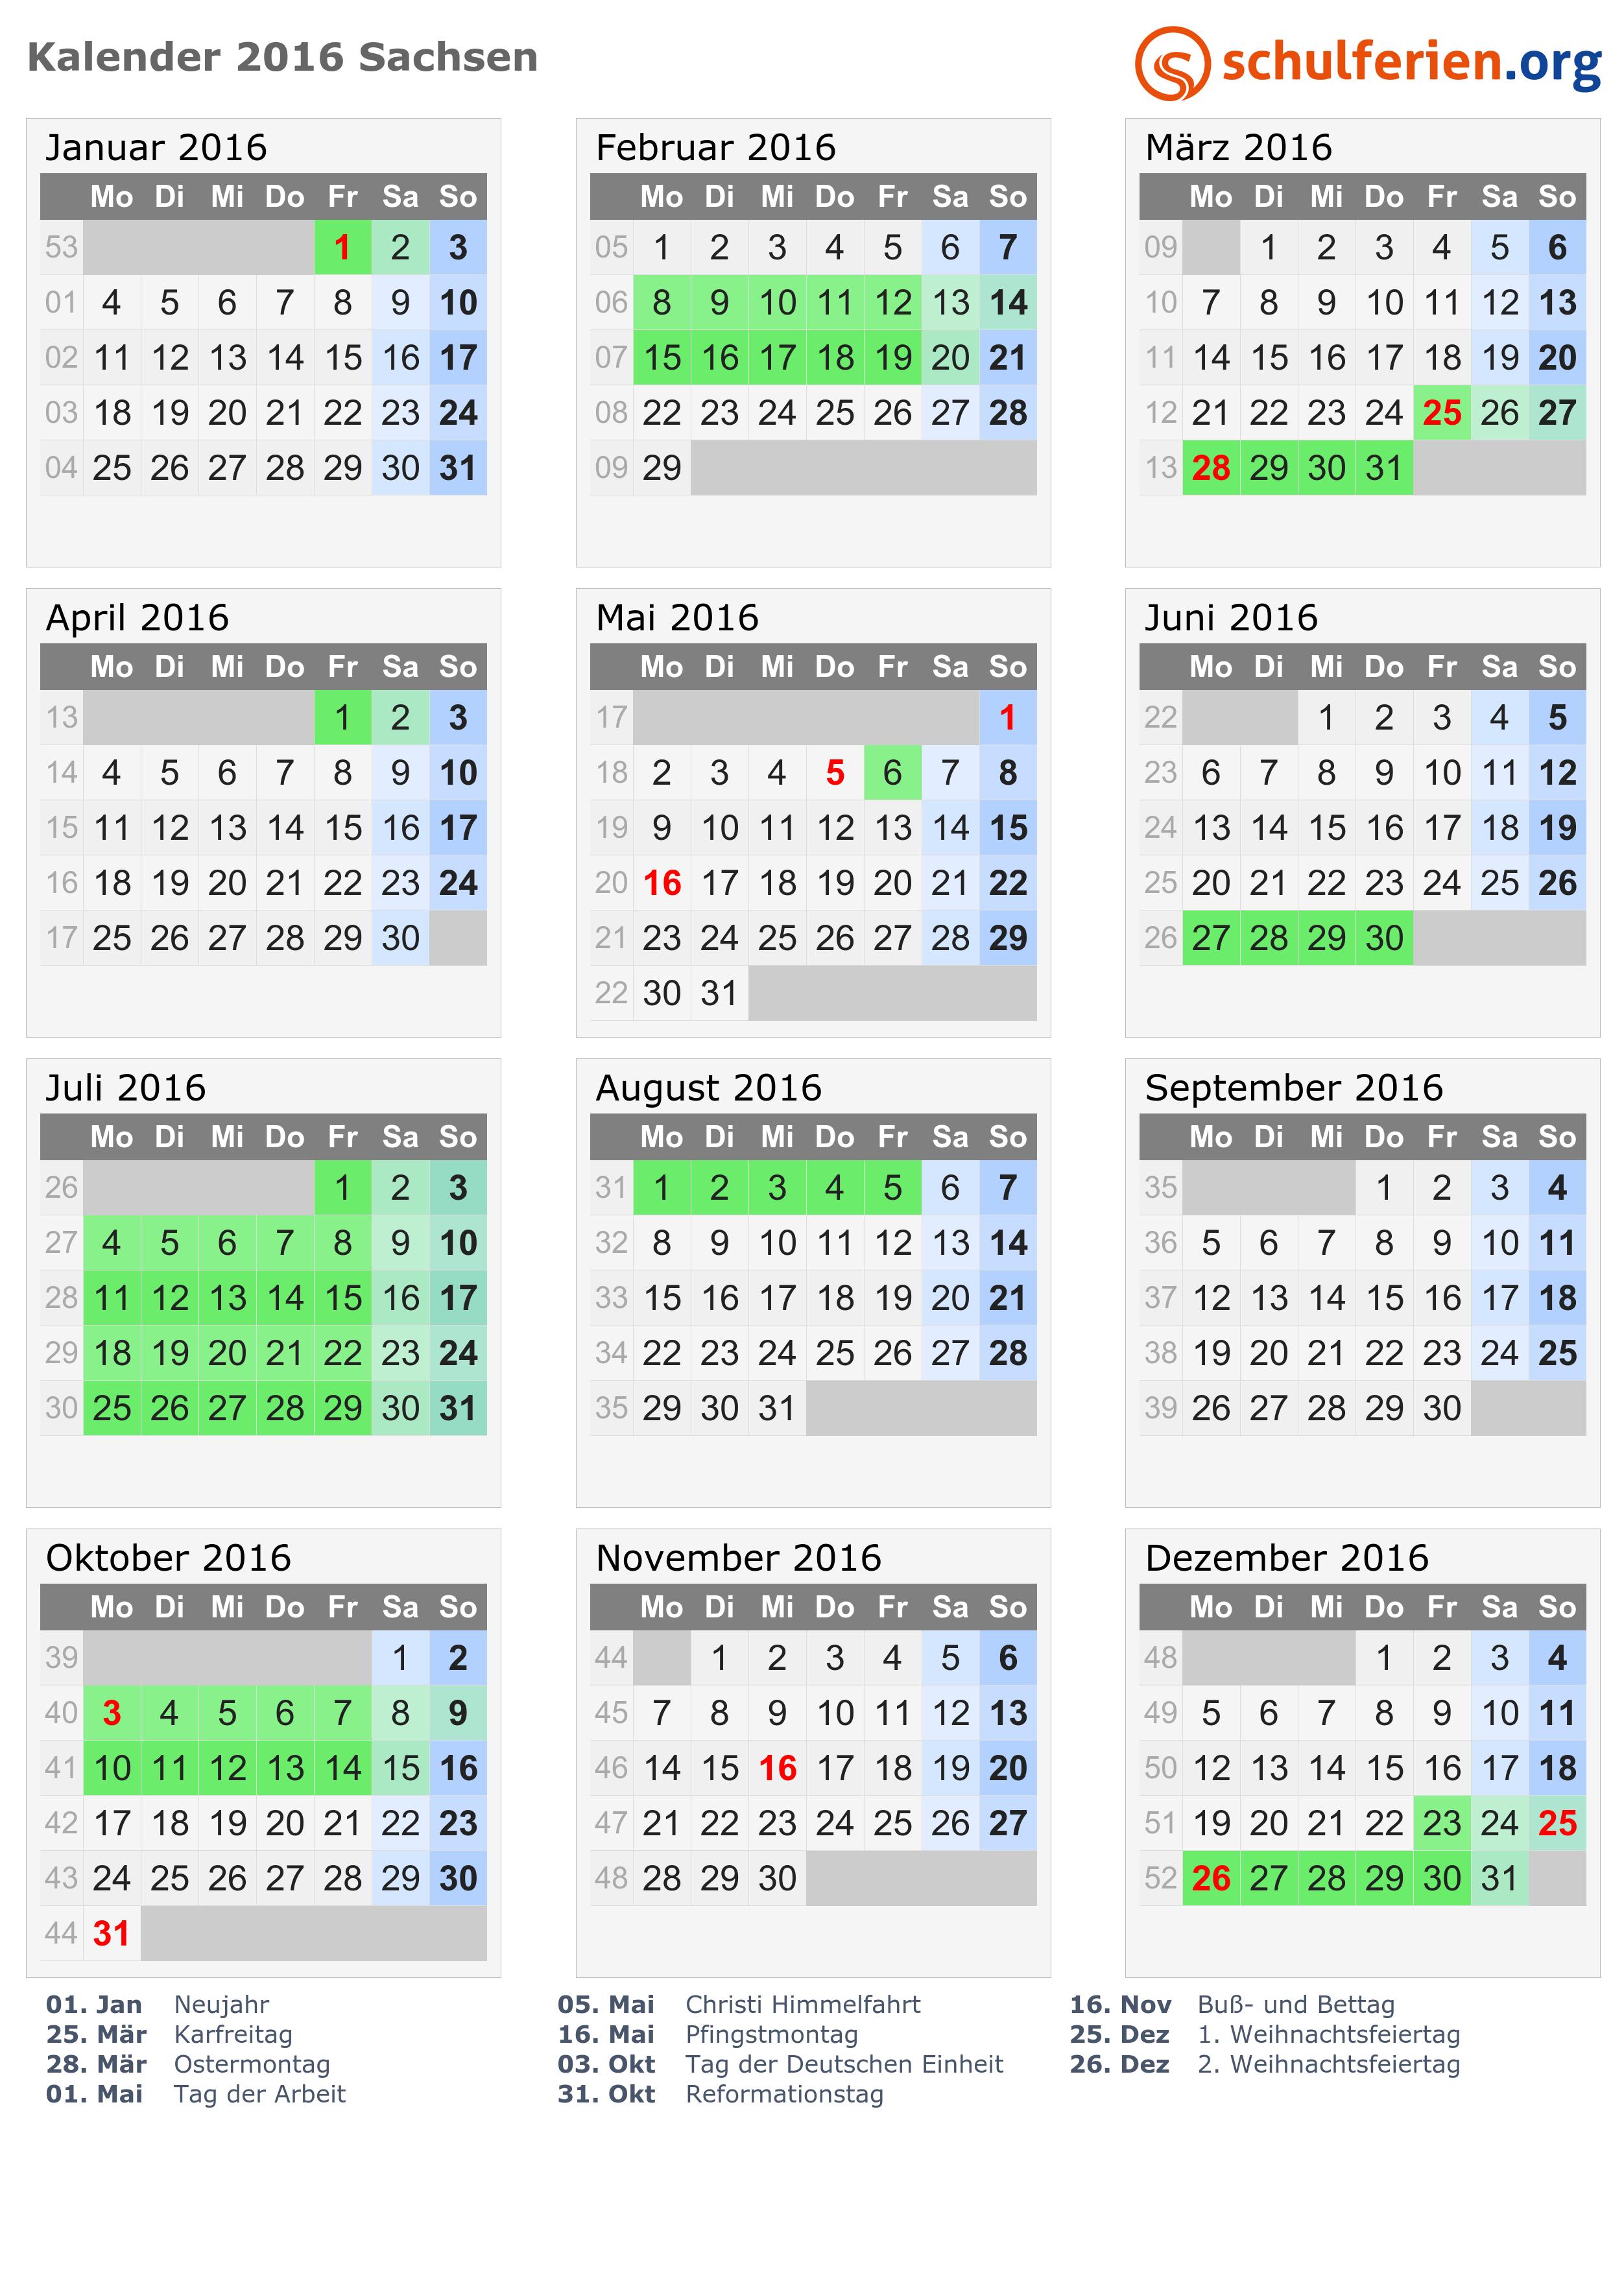 kalender 2016 ferien sachsen feiertage. Black Bedroom Furniture Sets. Home Design Ideas